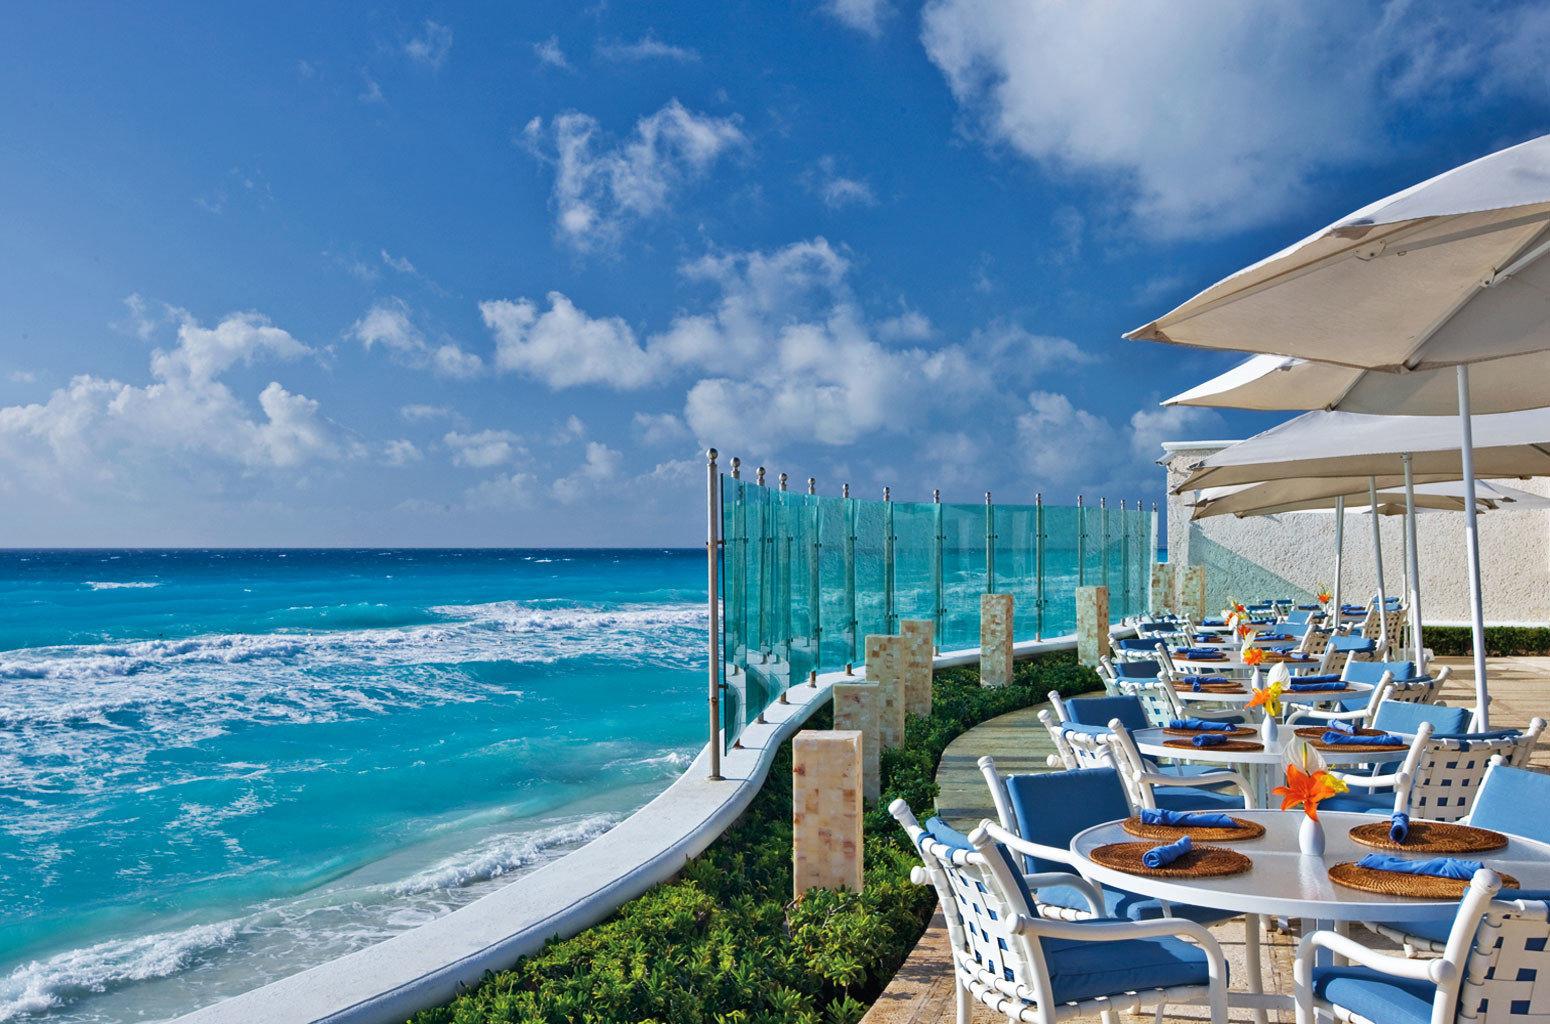 Bar Dining Drink Eat Elegant Hip Luxury Modern sky chair water Sea Ocean Beach caribbean lawn shore horizon Coast vehicle Resort marina Nature dock cape